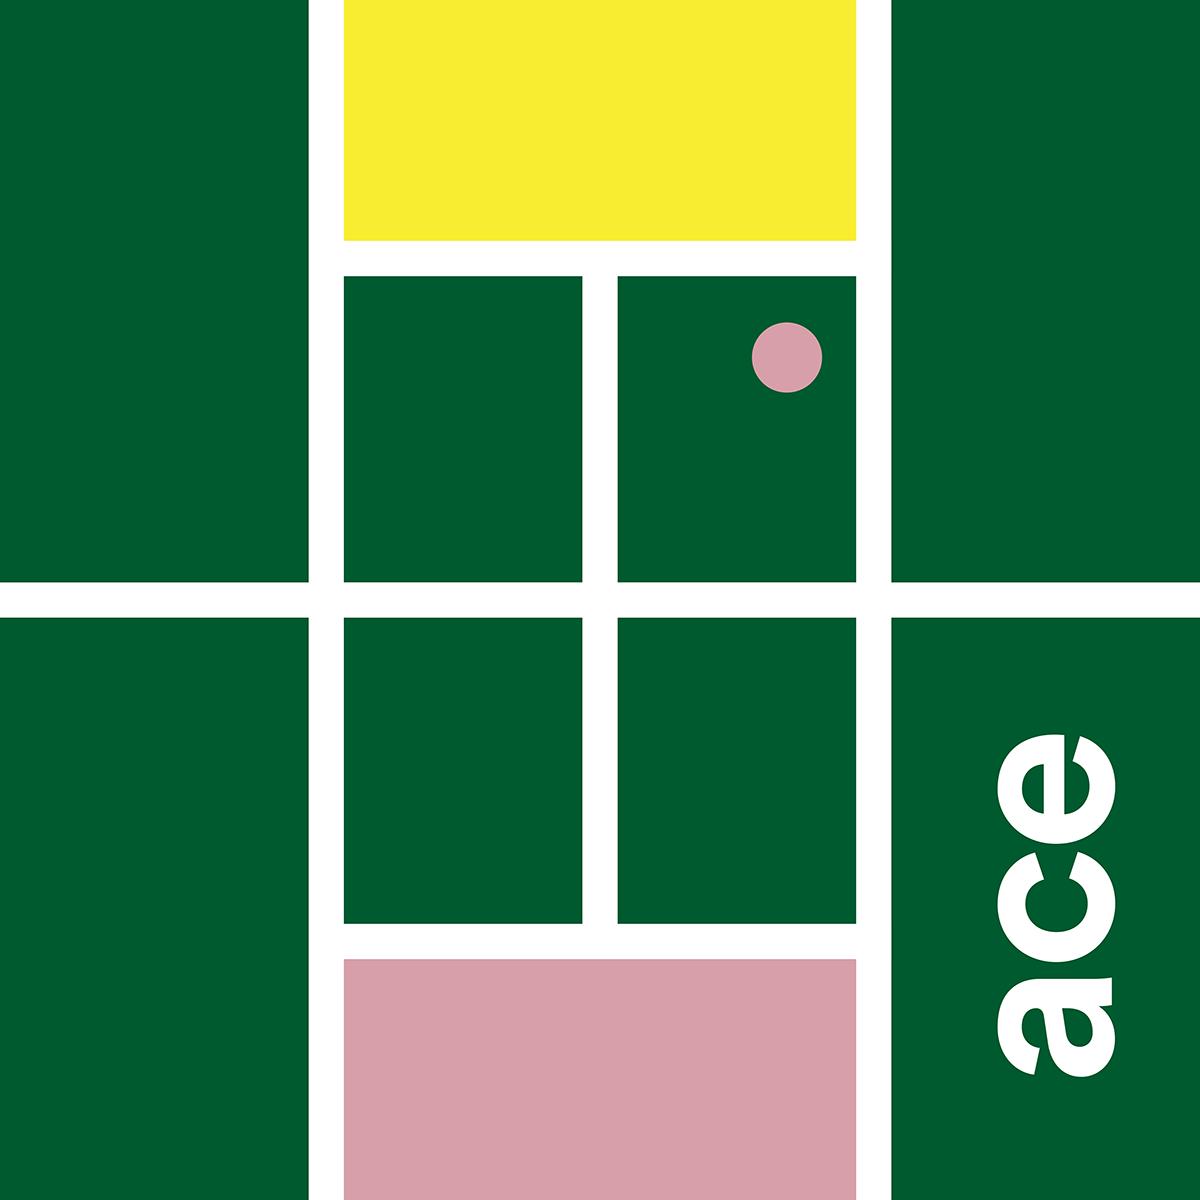 Minimalist Classroom Login ~ Minimalist visuals basketball tennis on wacom gallery